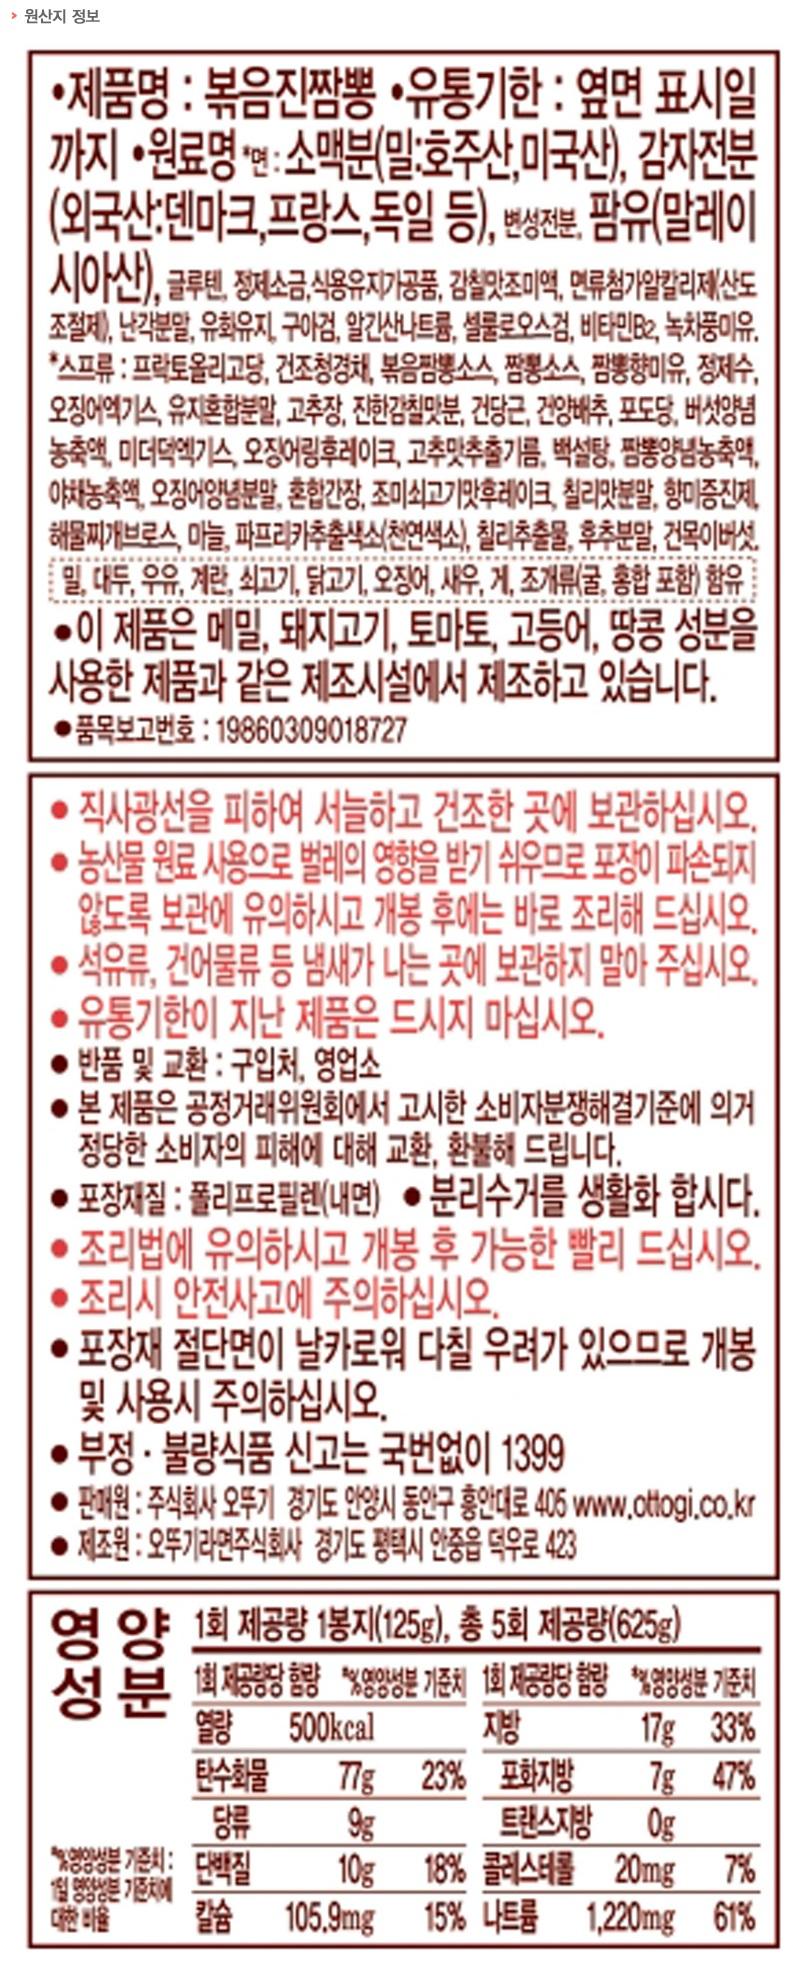 [ NongShim ] [BOX] Saut-Jin-Jjamppong Noodle Ramen (4+1) 1BOX (40pcs)